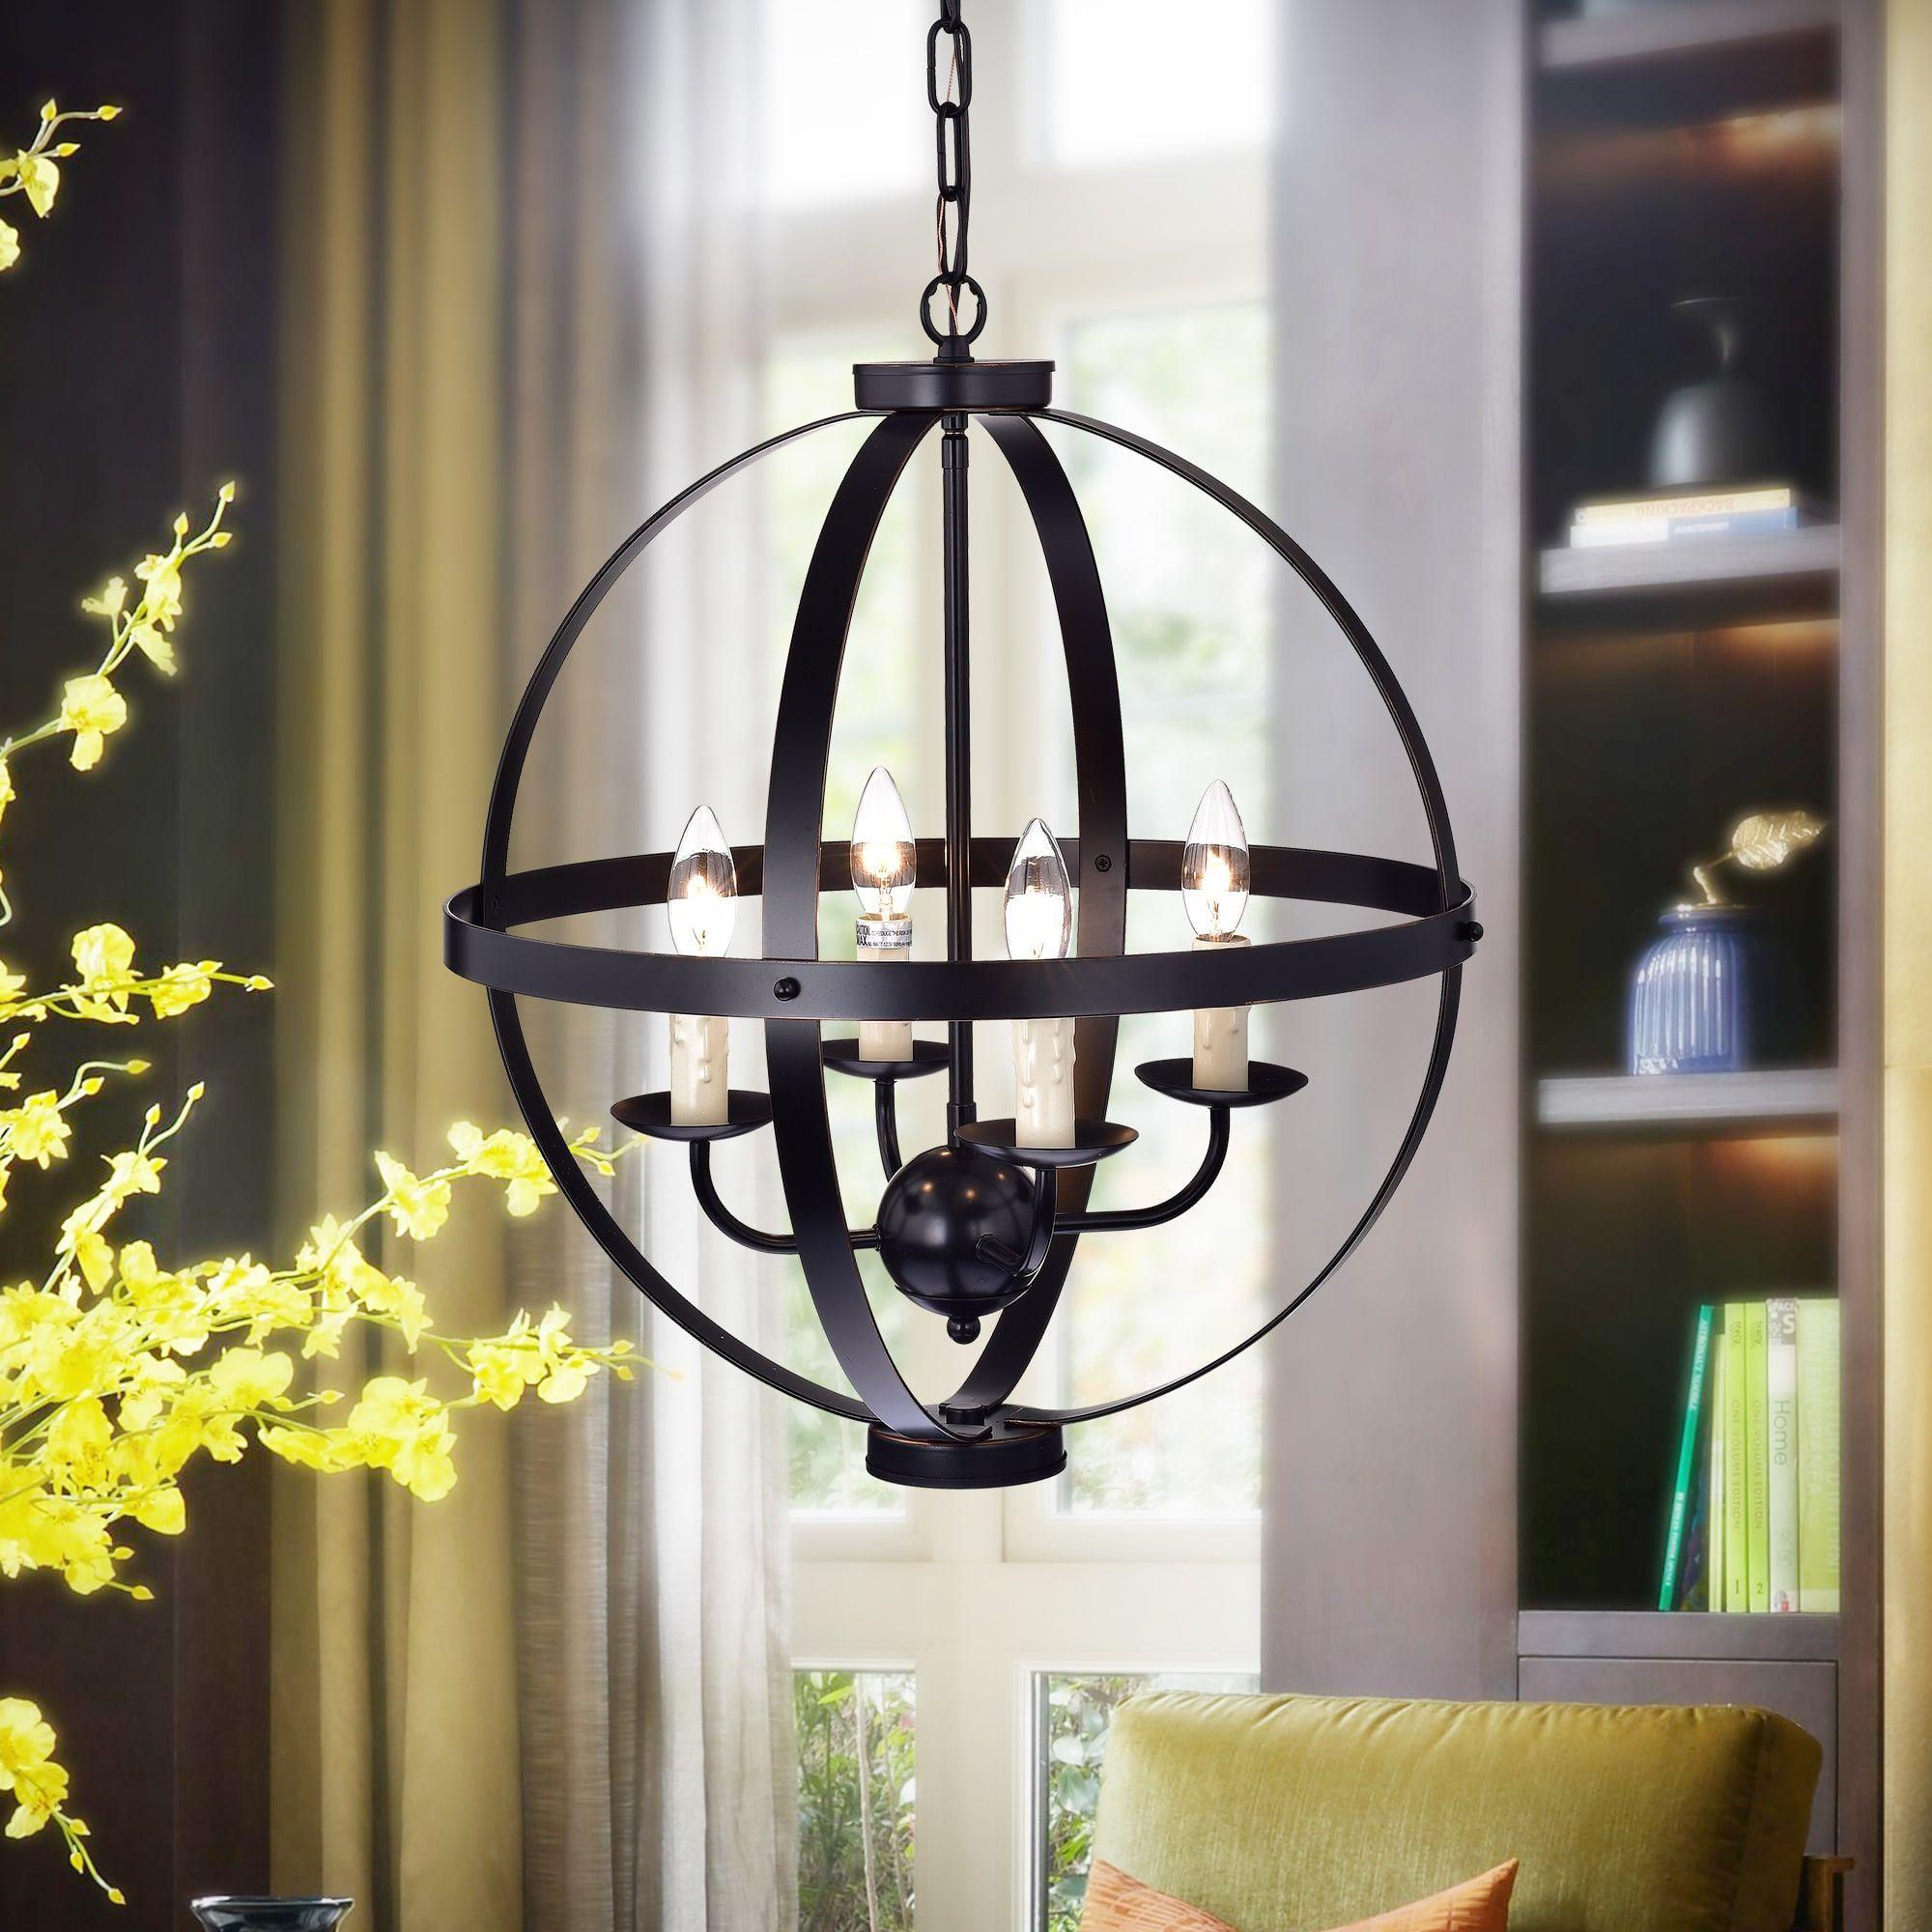 Nisic 4 Light 17 Inch Oil Rubbed Bronze Globe Pendant Globe